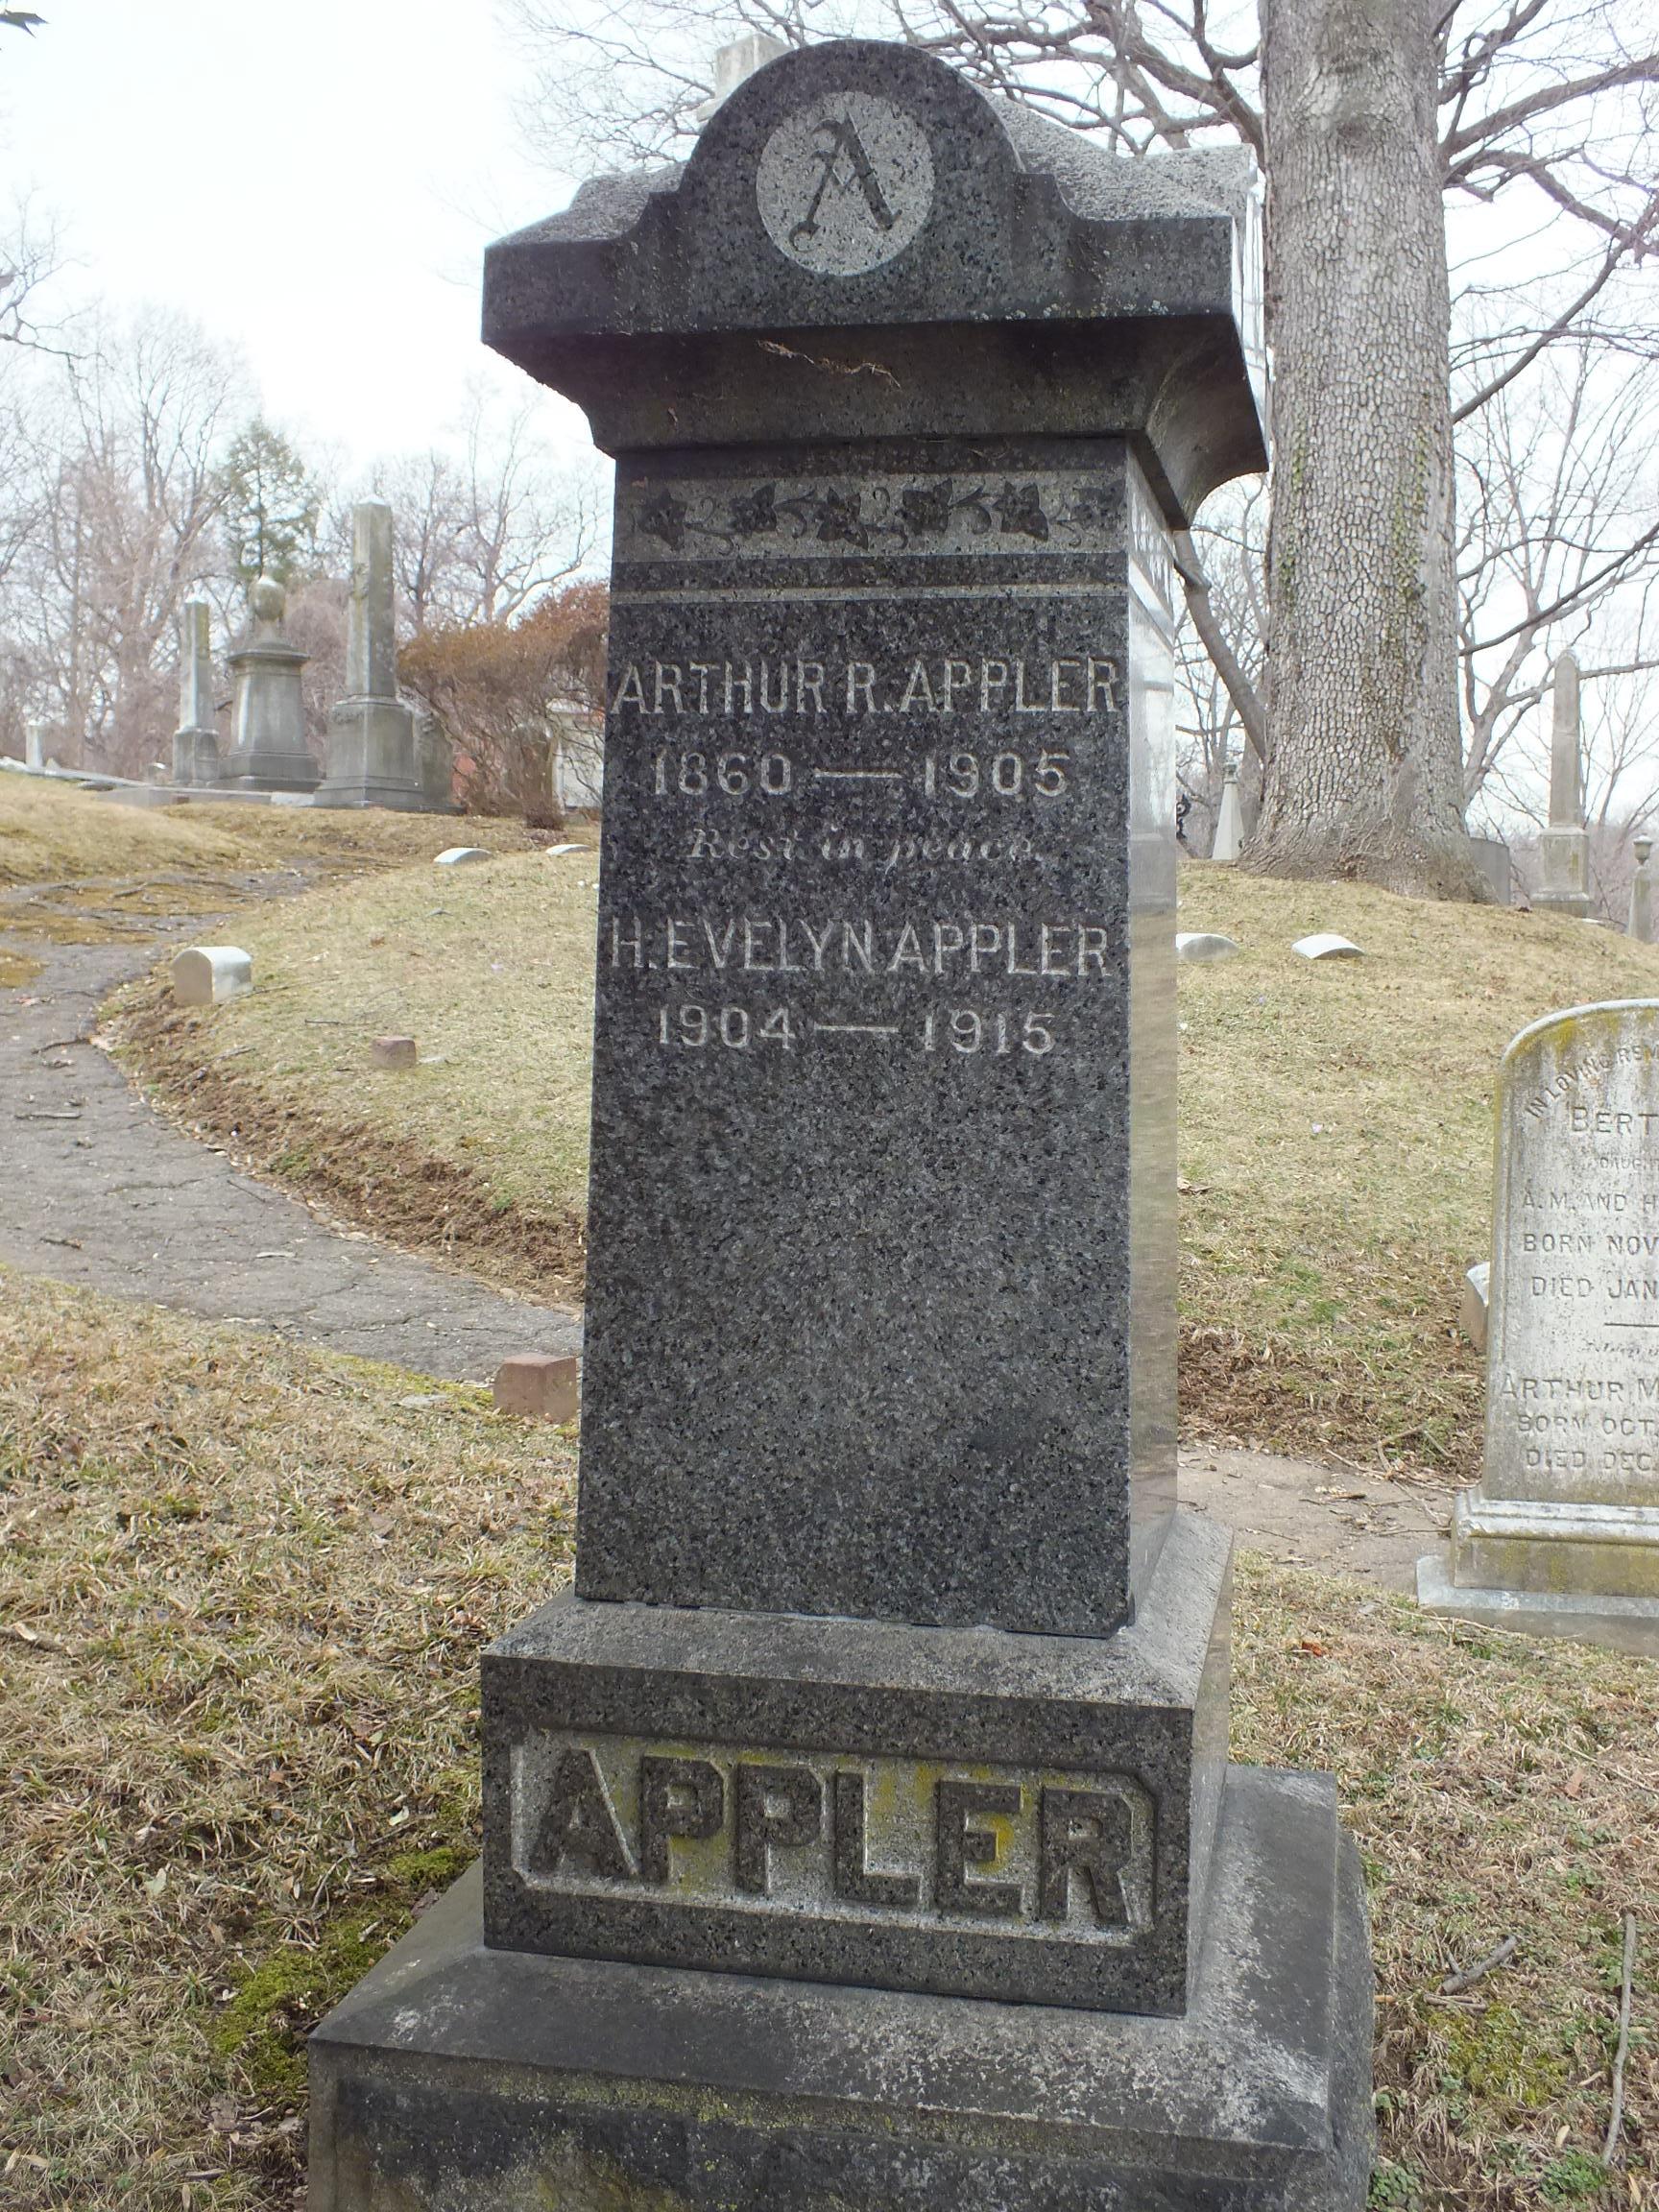 Arthur R. Appler